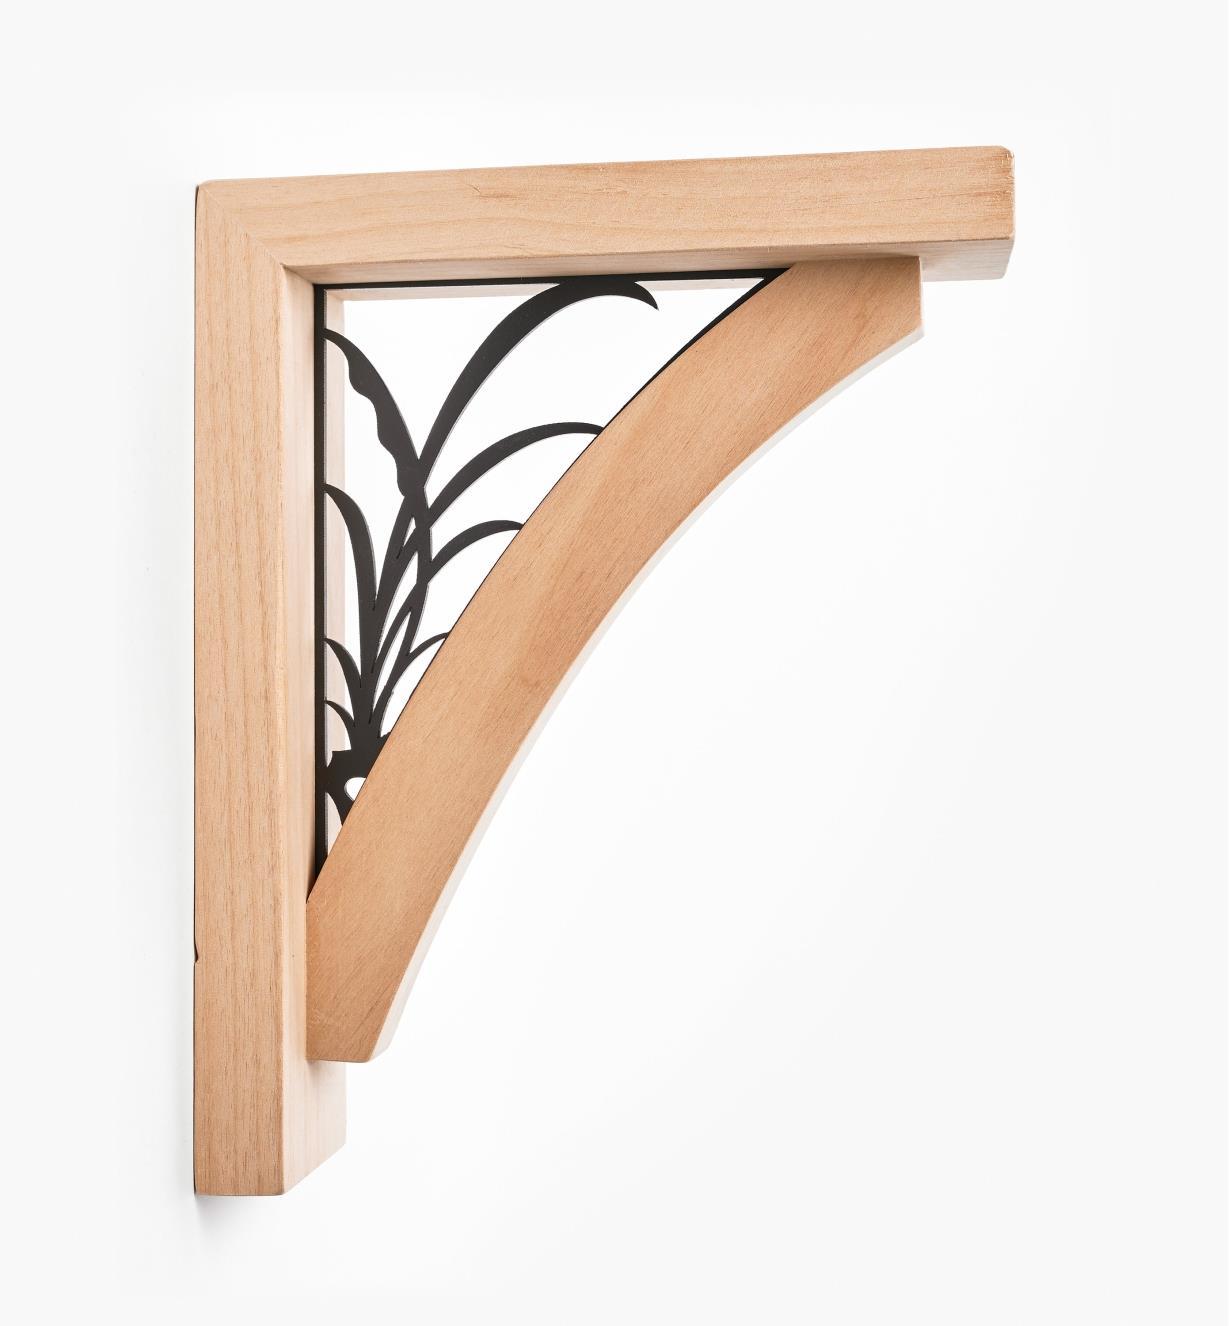 00S0731 - Leaf Wooden Shelf Bracket